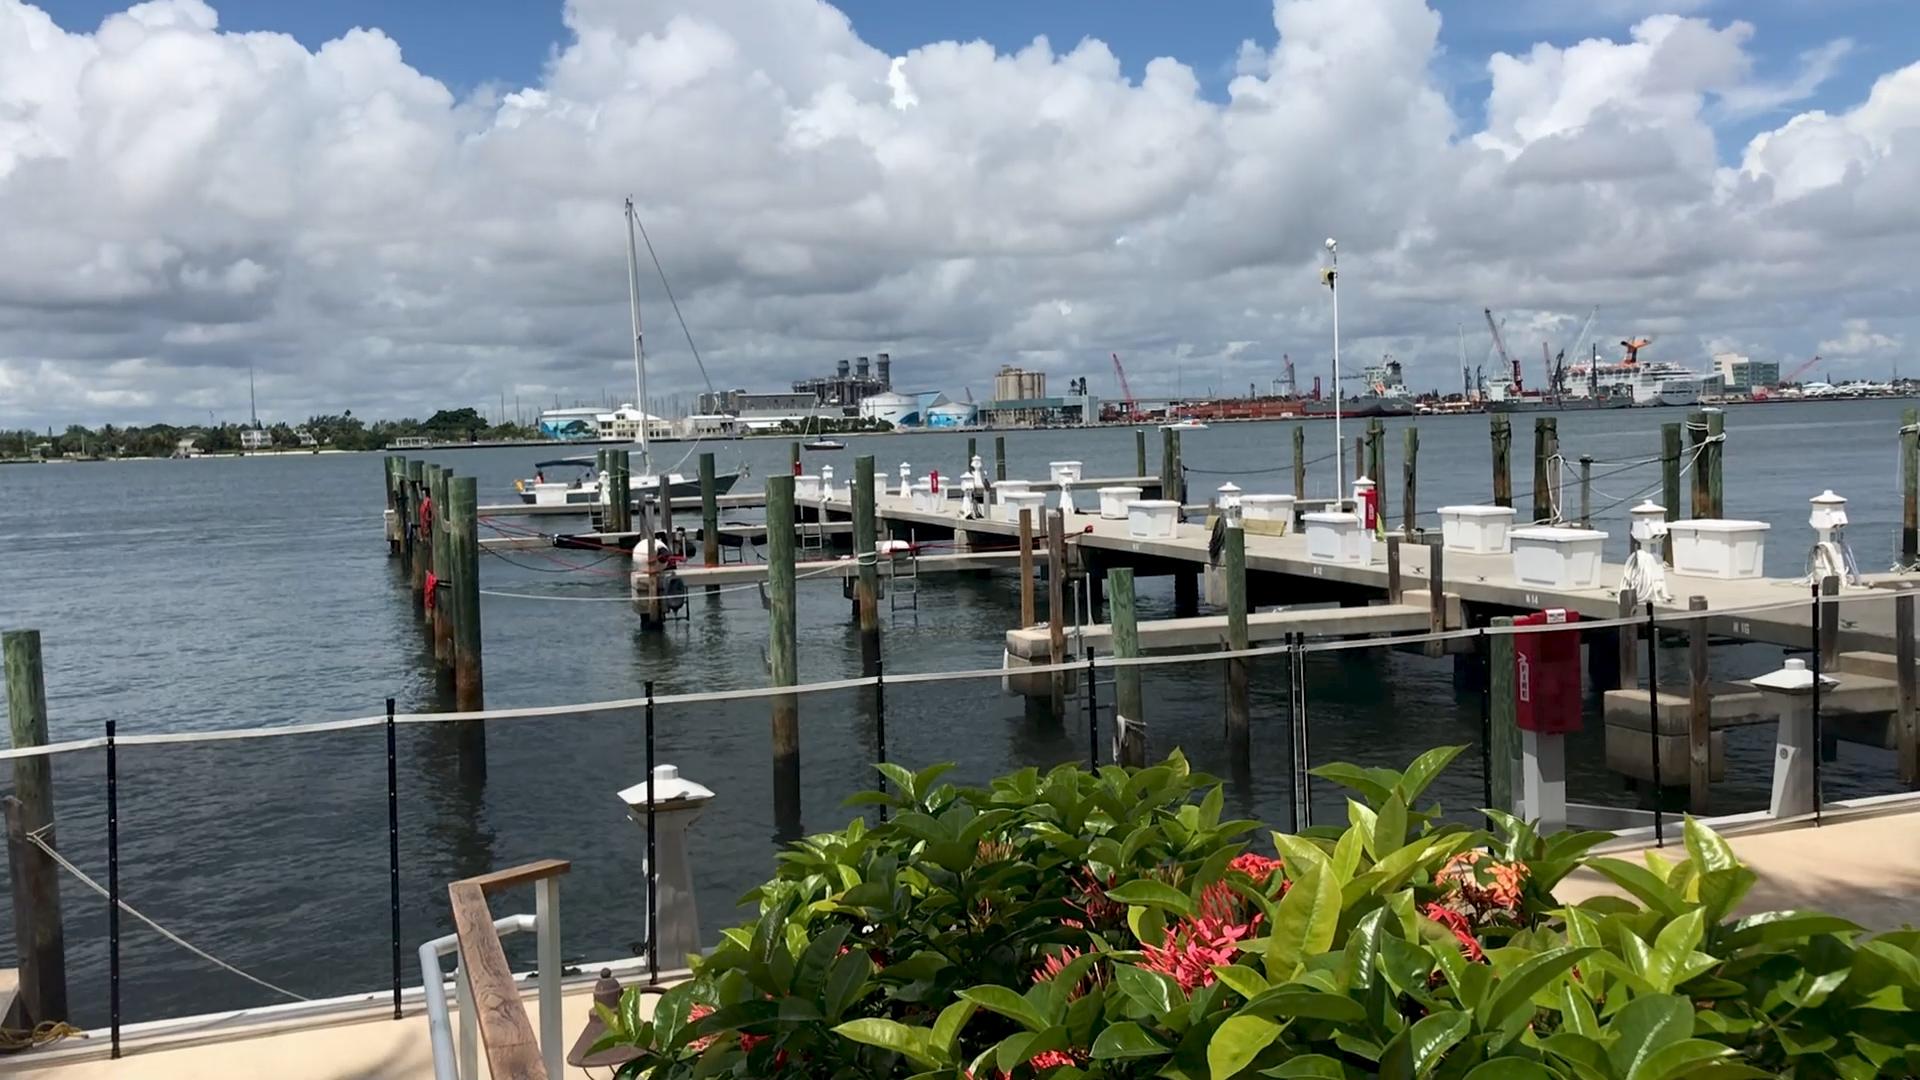 Sailfish Club Marina Cleared of boats 8-30-19 | Palm Beach